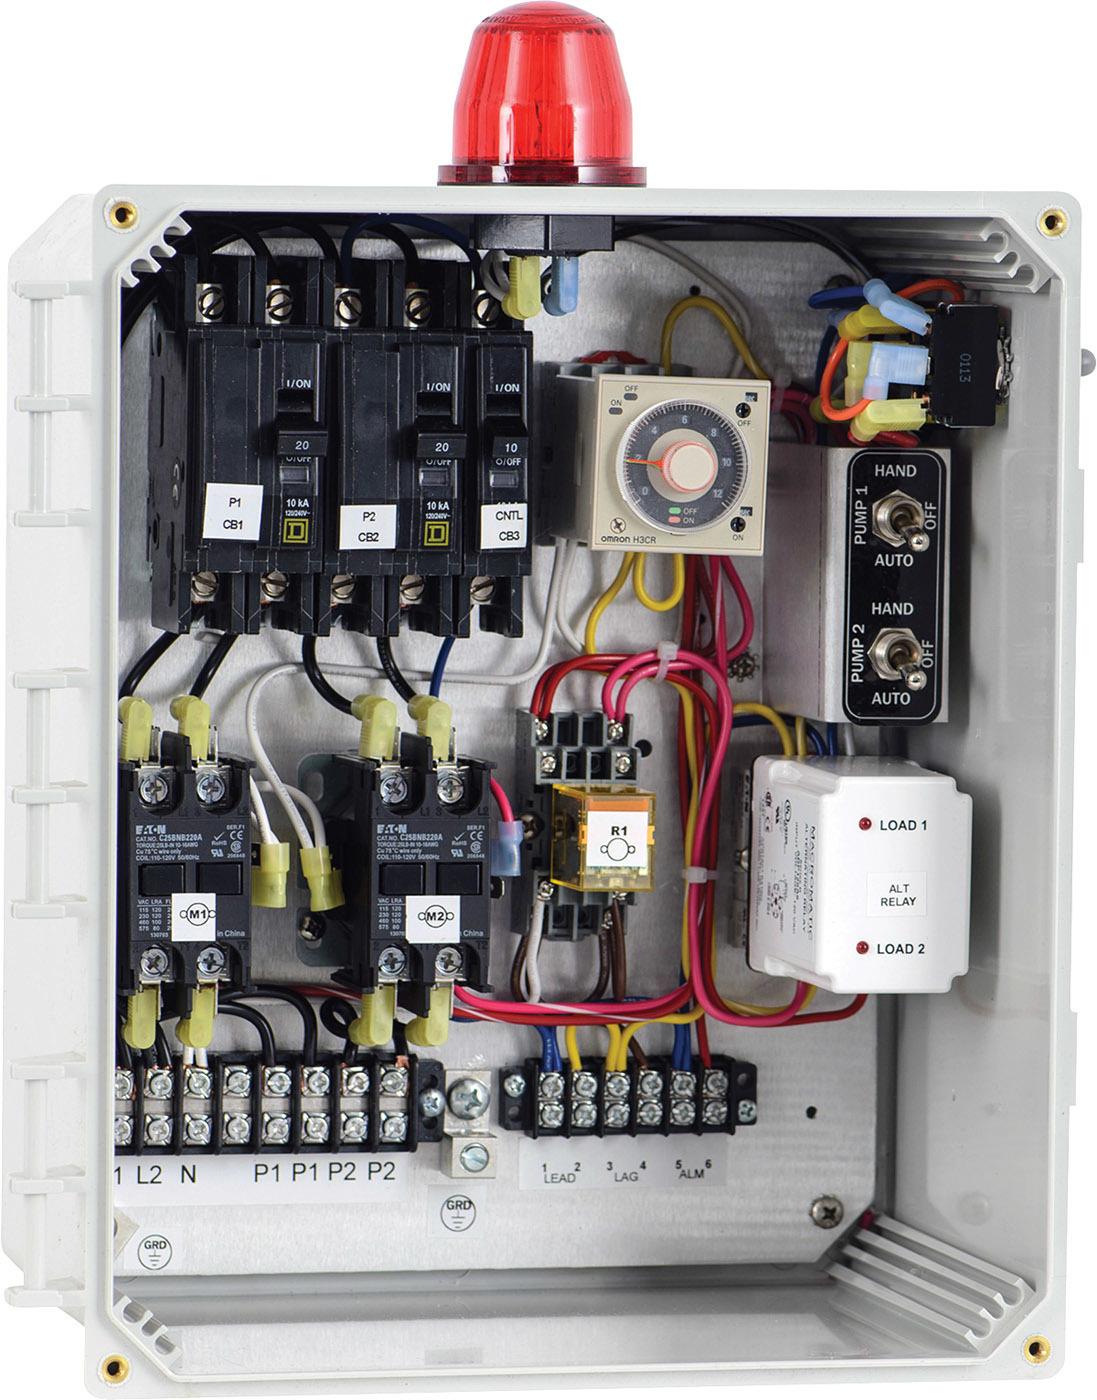 [DIAGRAM_09CH]  Product Focus - September 2019 | Onsite Installer | Wiring Diagram Septic Tank Control |  | Onsite Installer